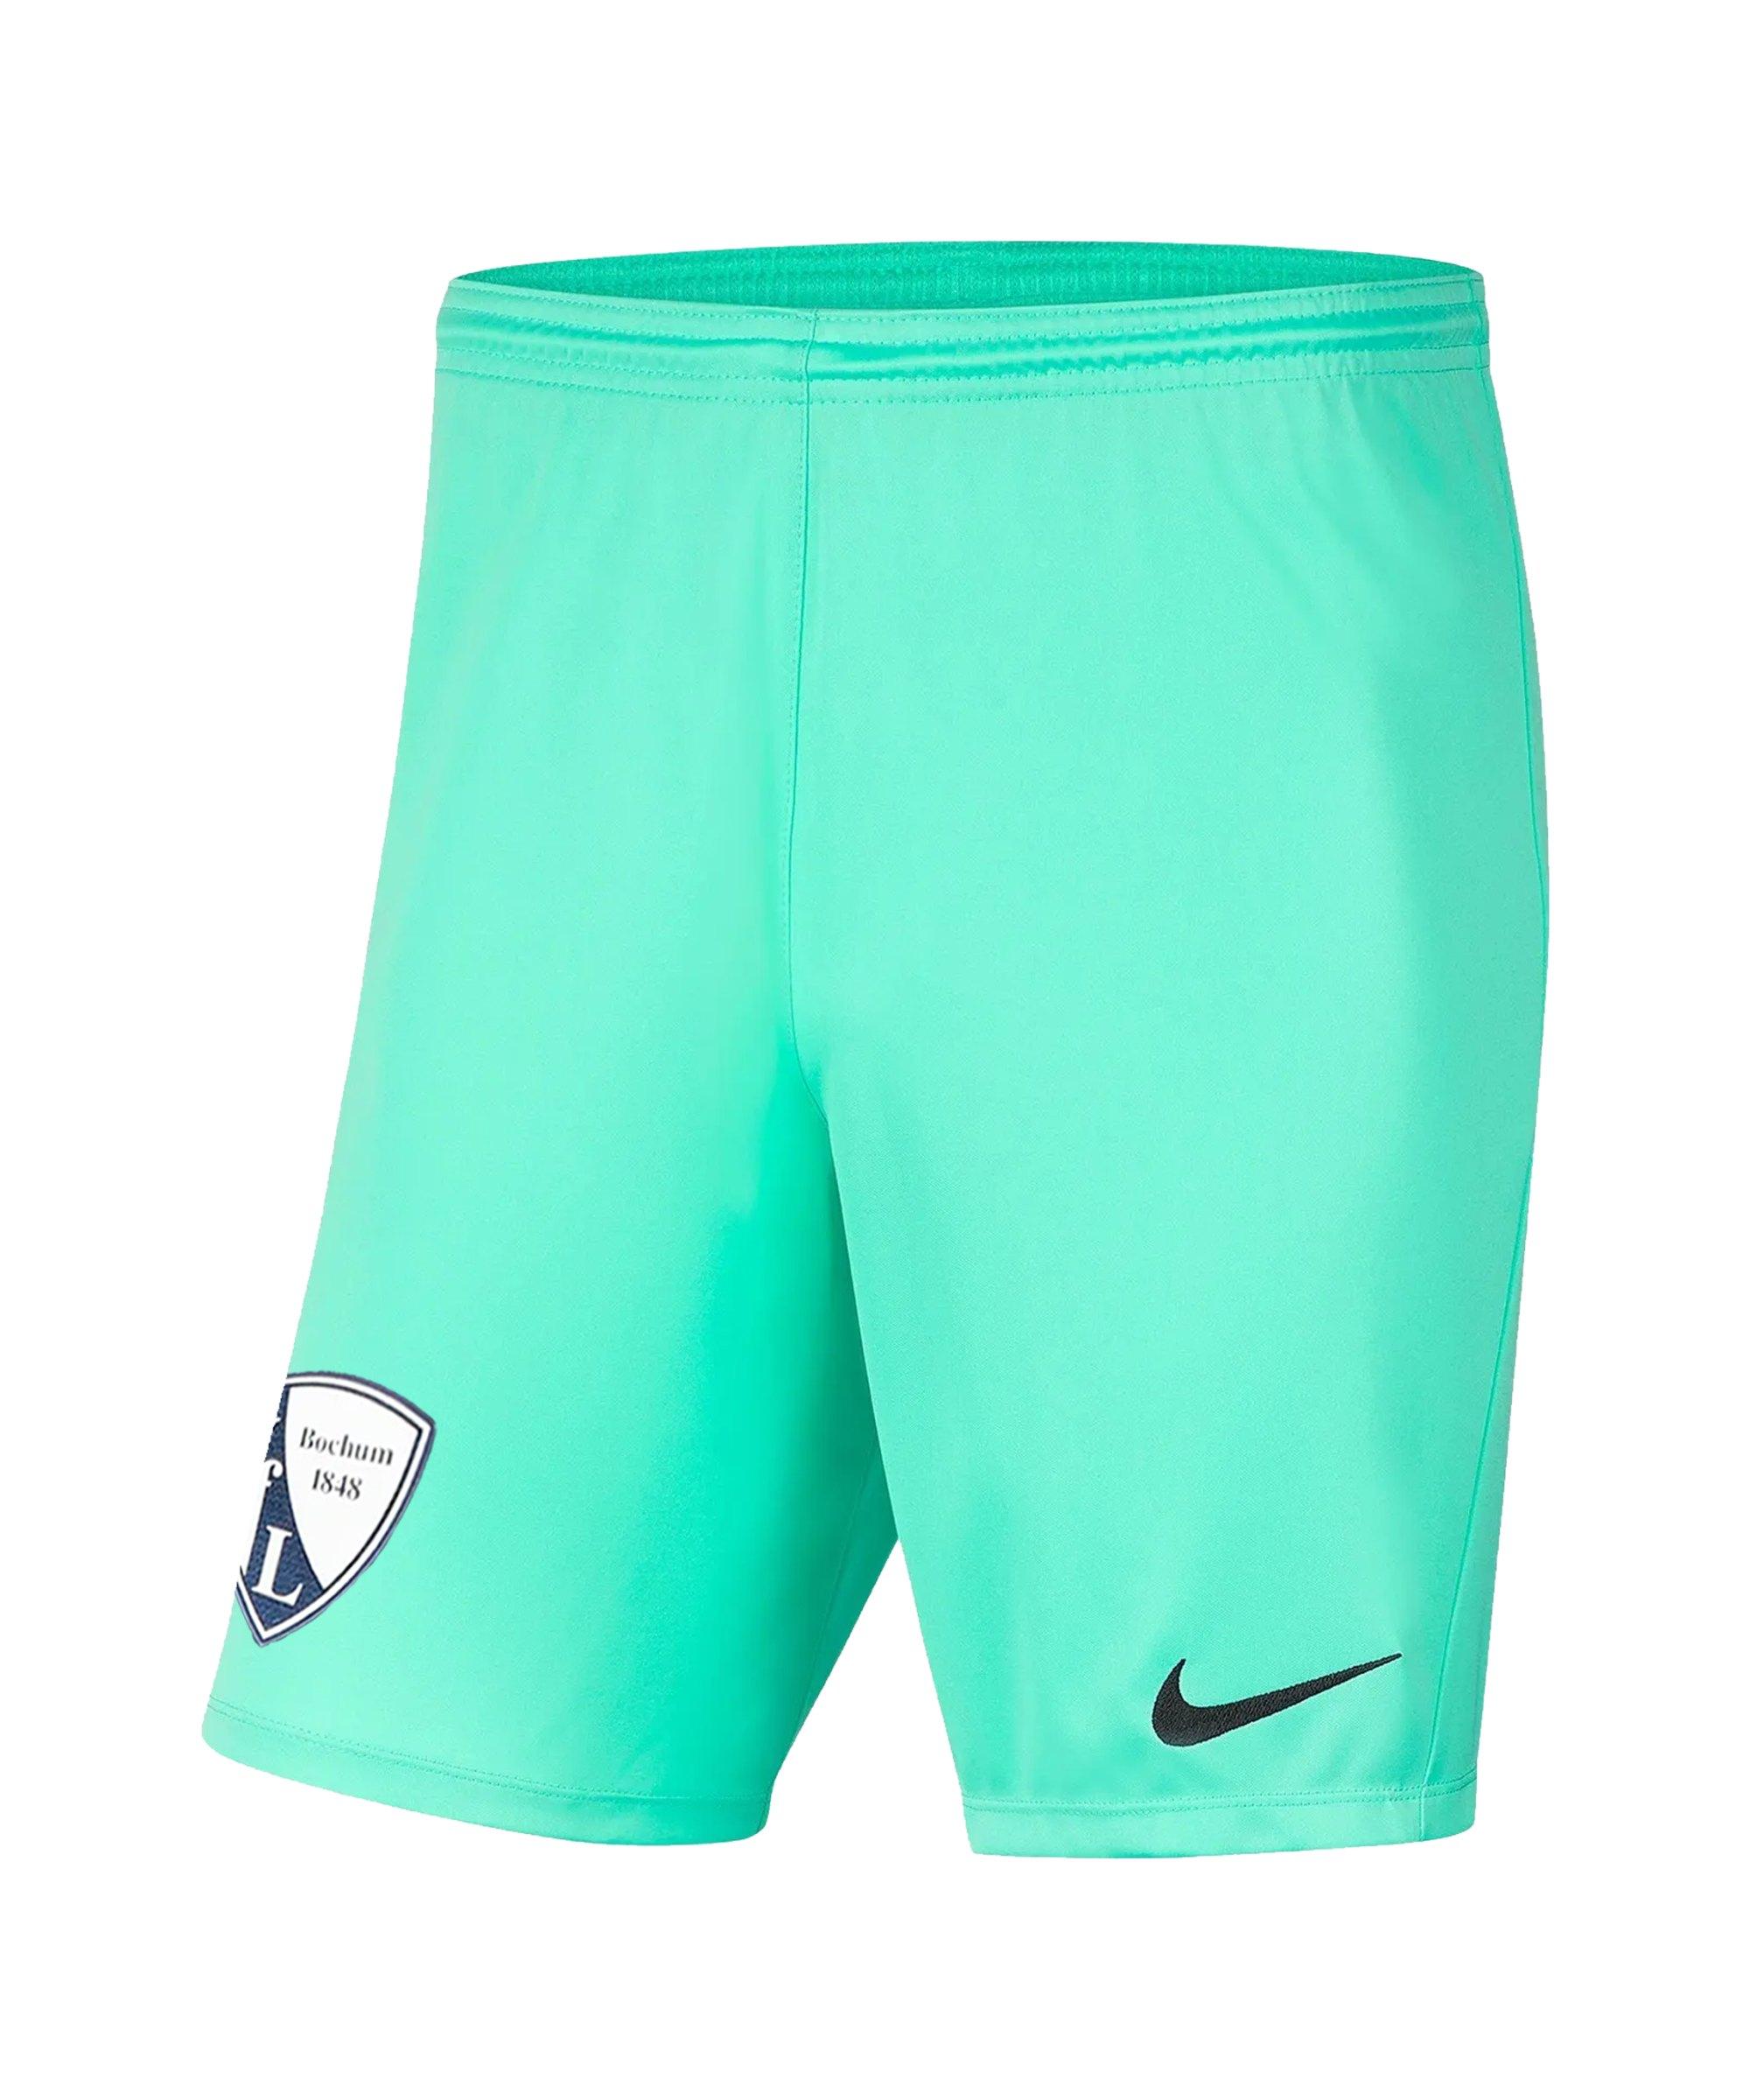 Nike VfL Bochum Short 3rd 2021/2022 Türkis F354 - tuerkis